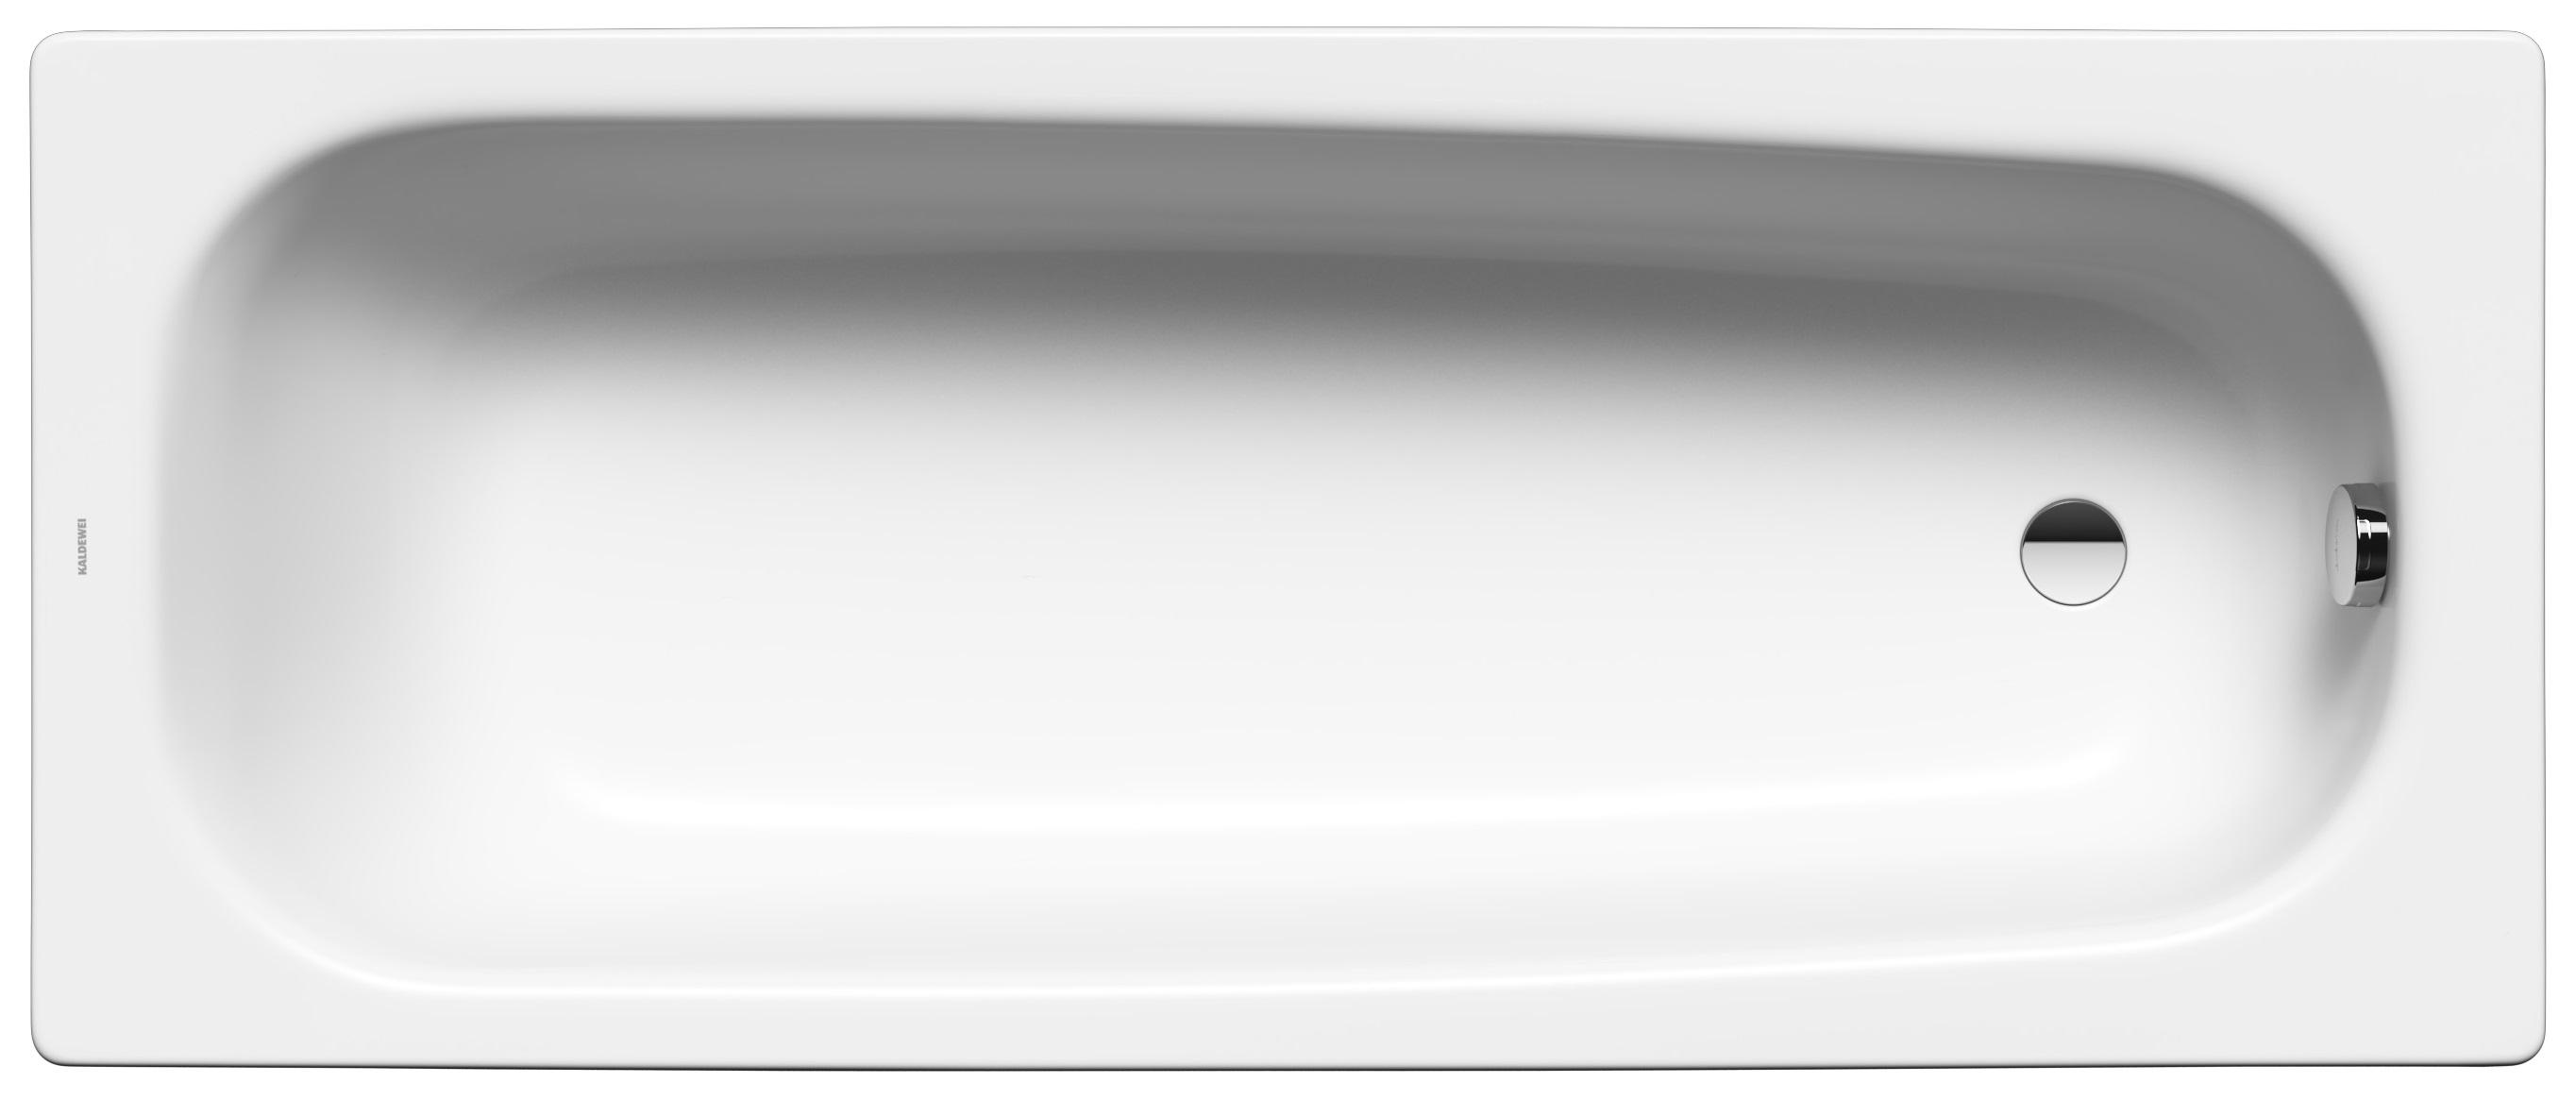 Kaldewei Saniform Medium - ocelová vana obdélníková 170 x 70 cm 245